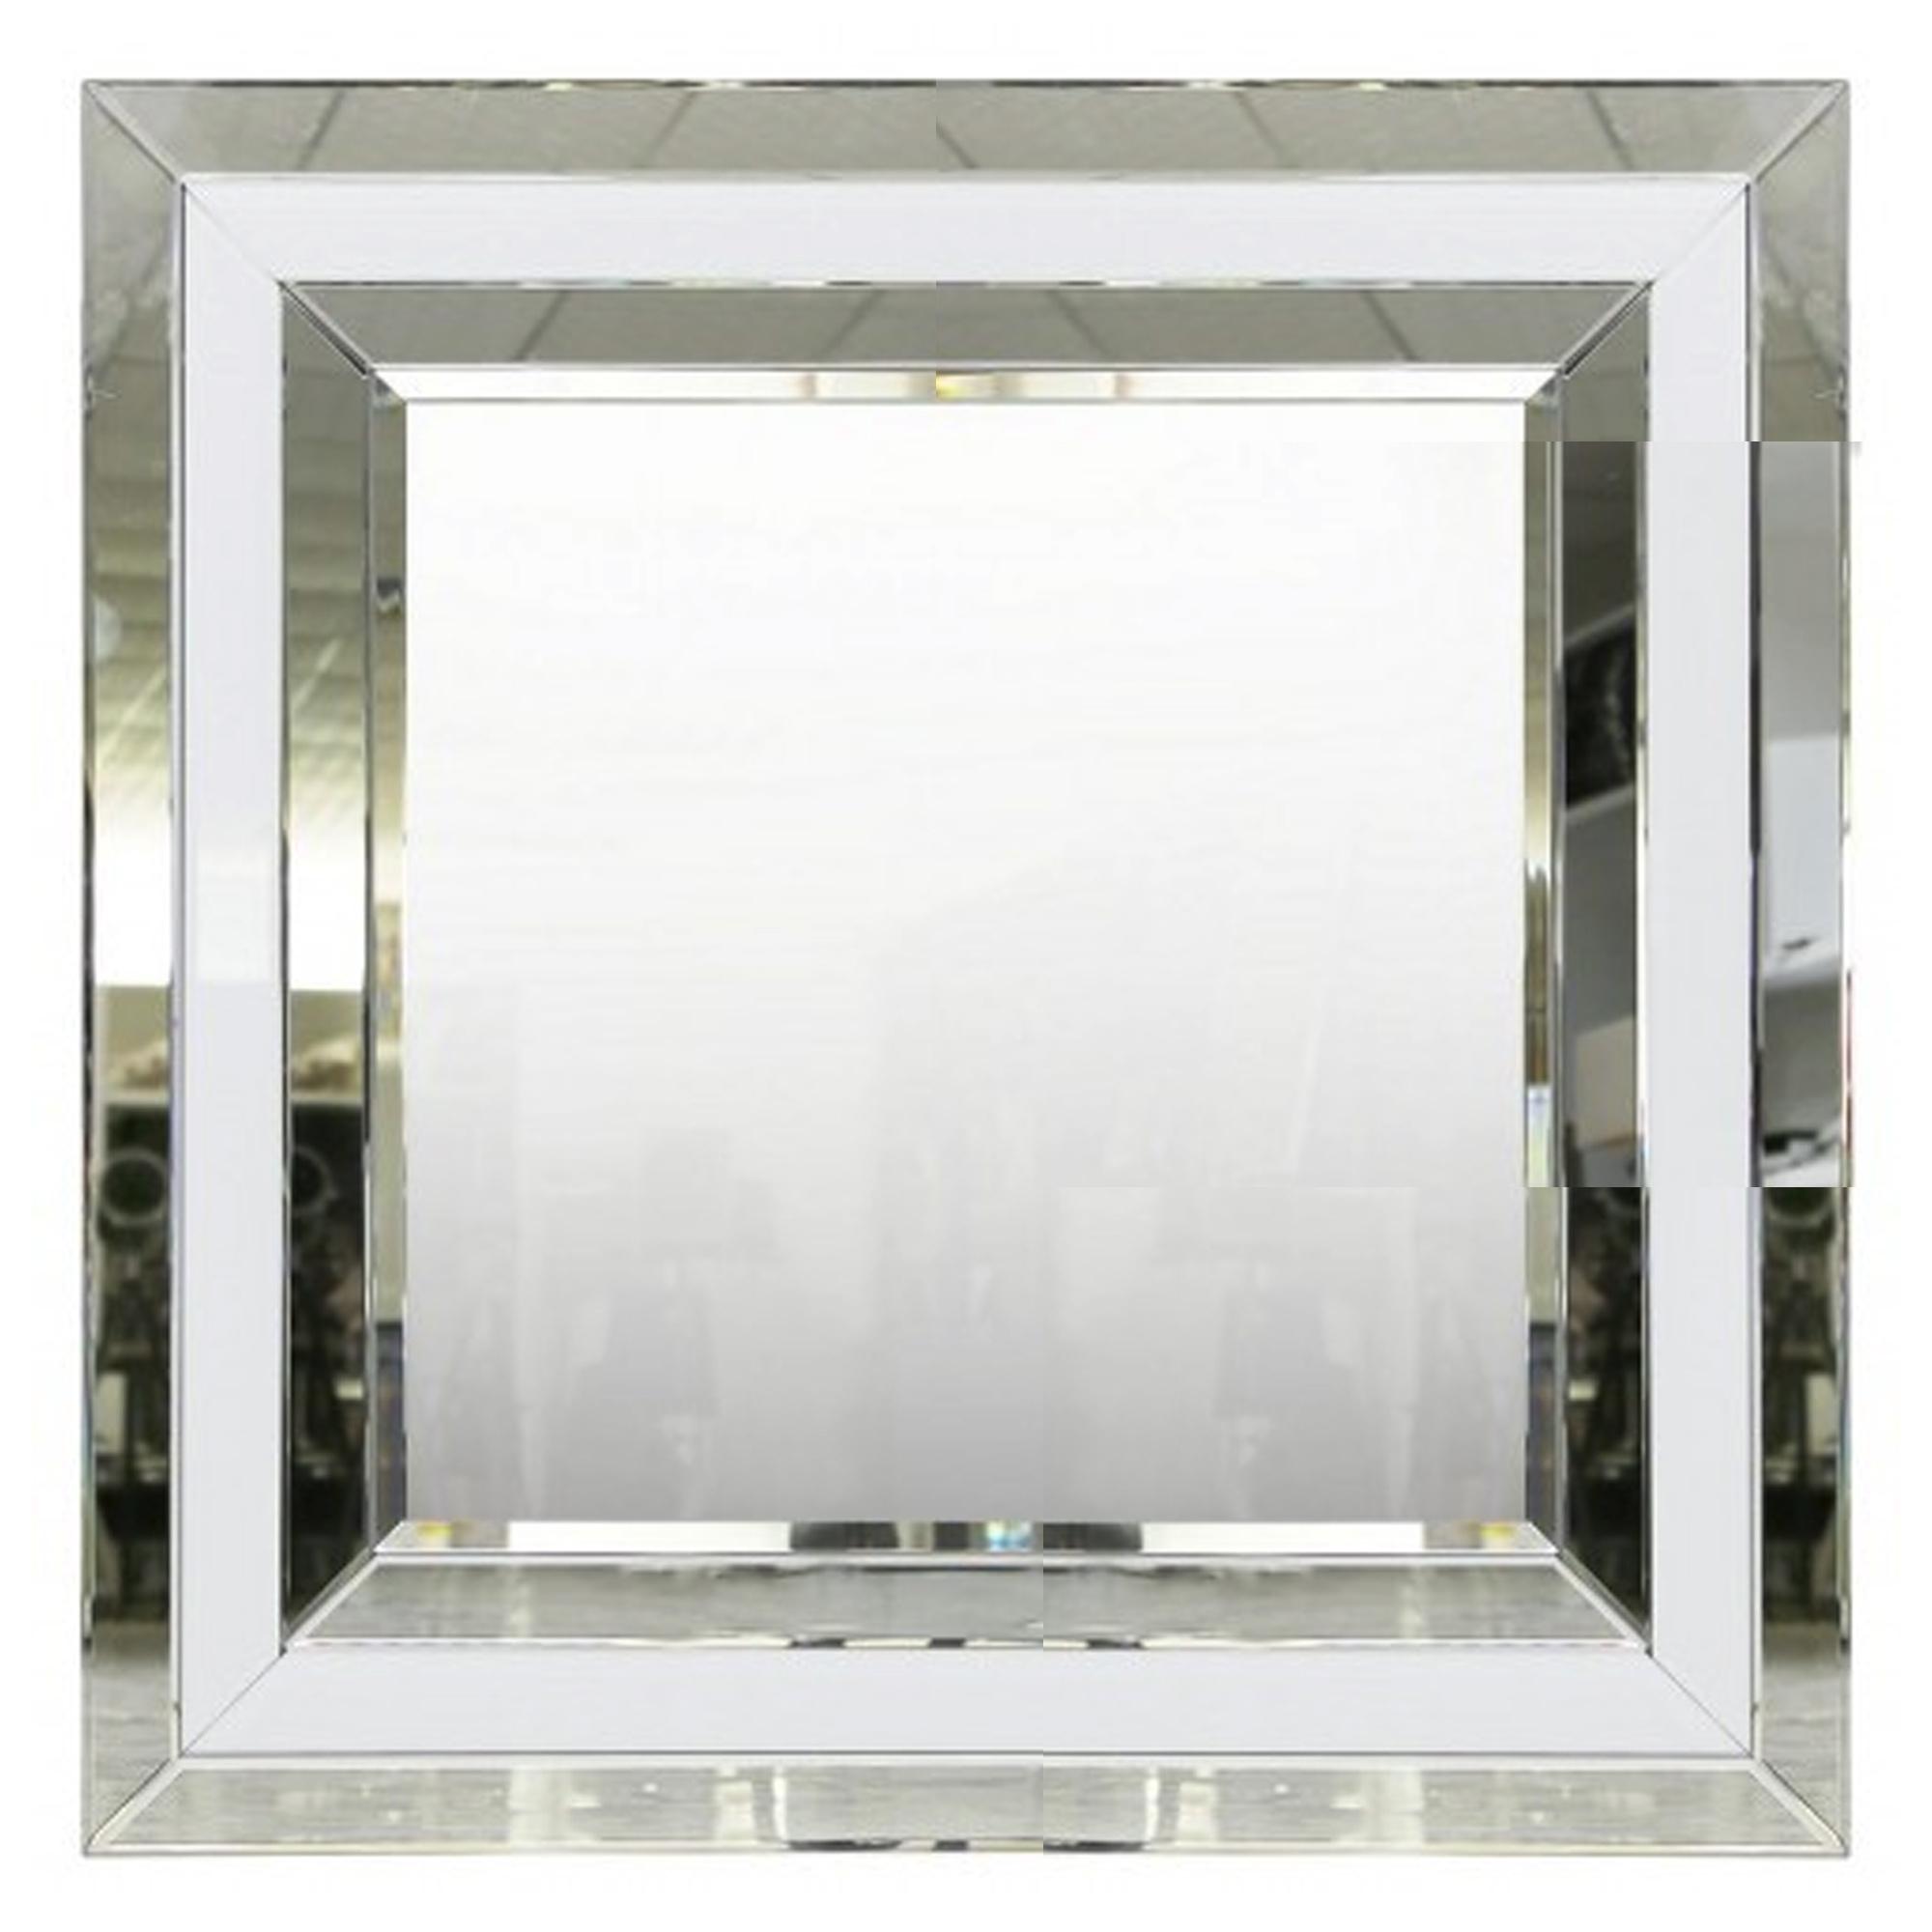 Alghero White Mirrored Square Wall Mirror Wall Mirrors